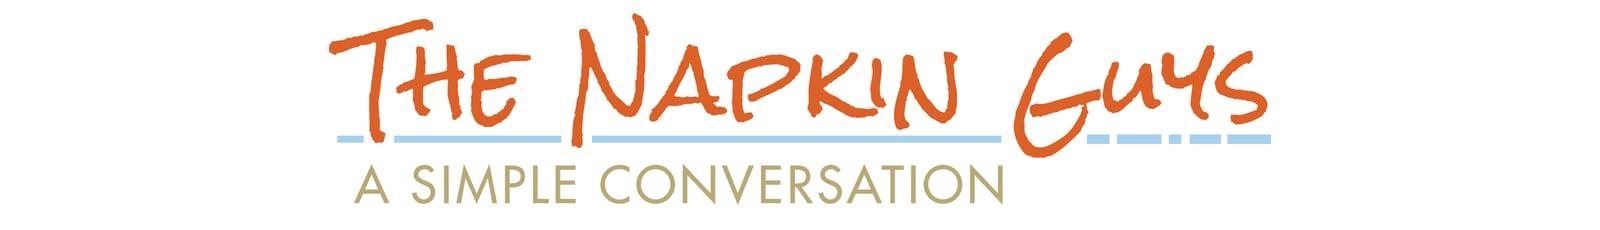 the-napkin-guys-banner